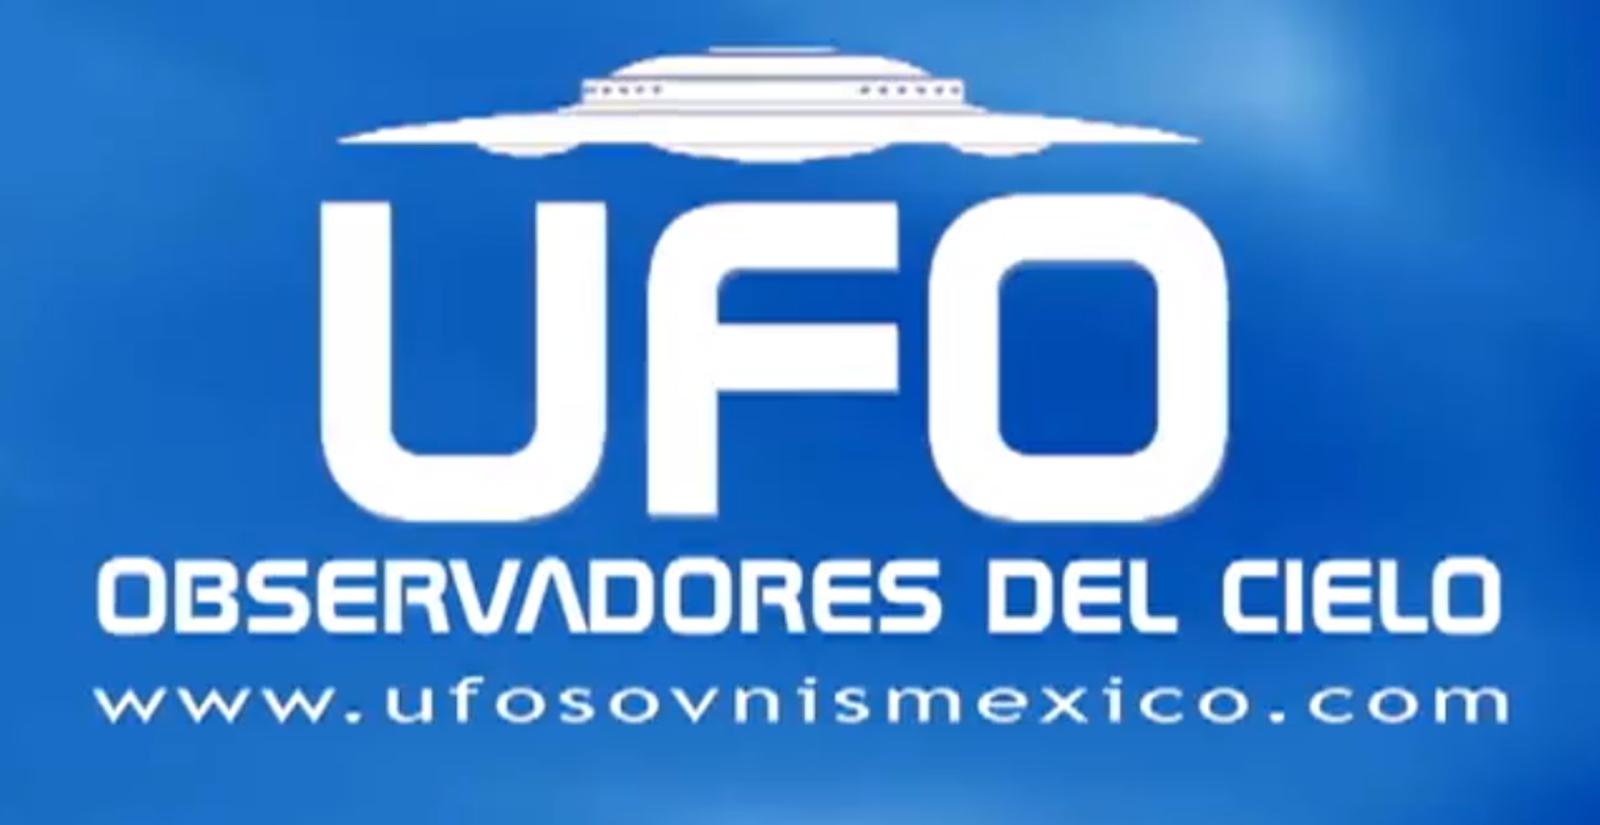 www.ufosovnismexico.com